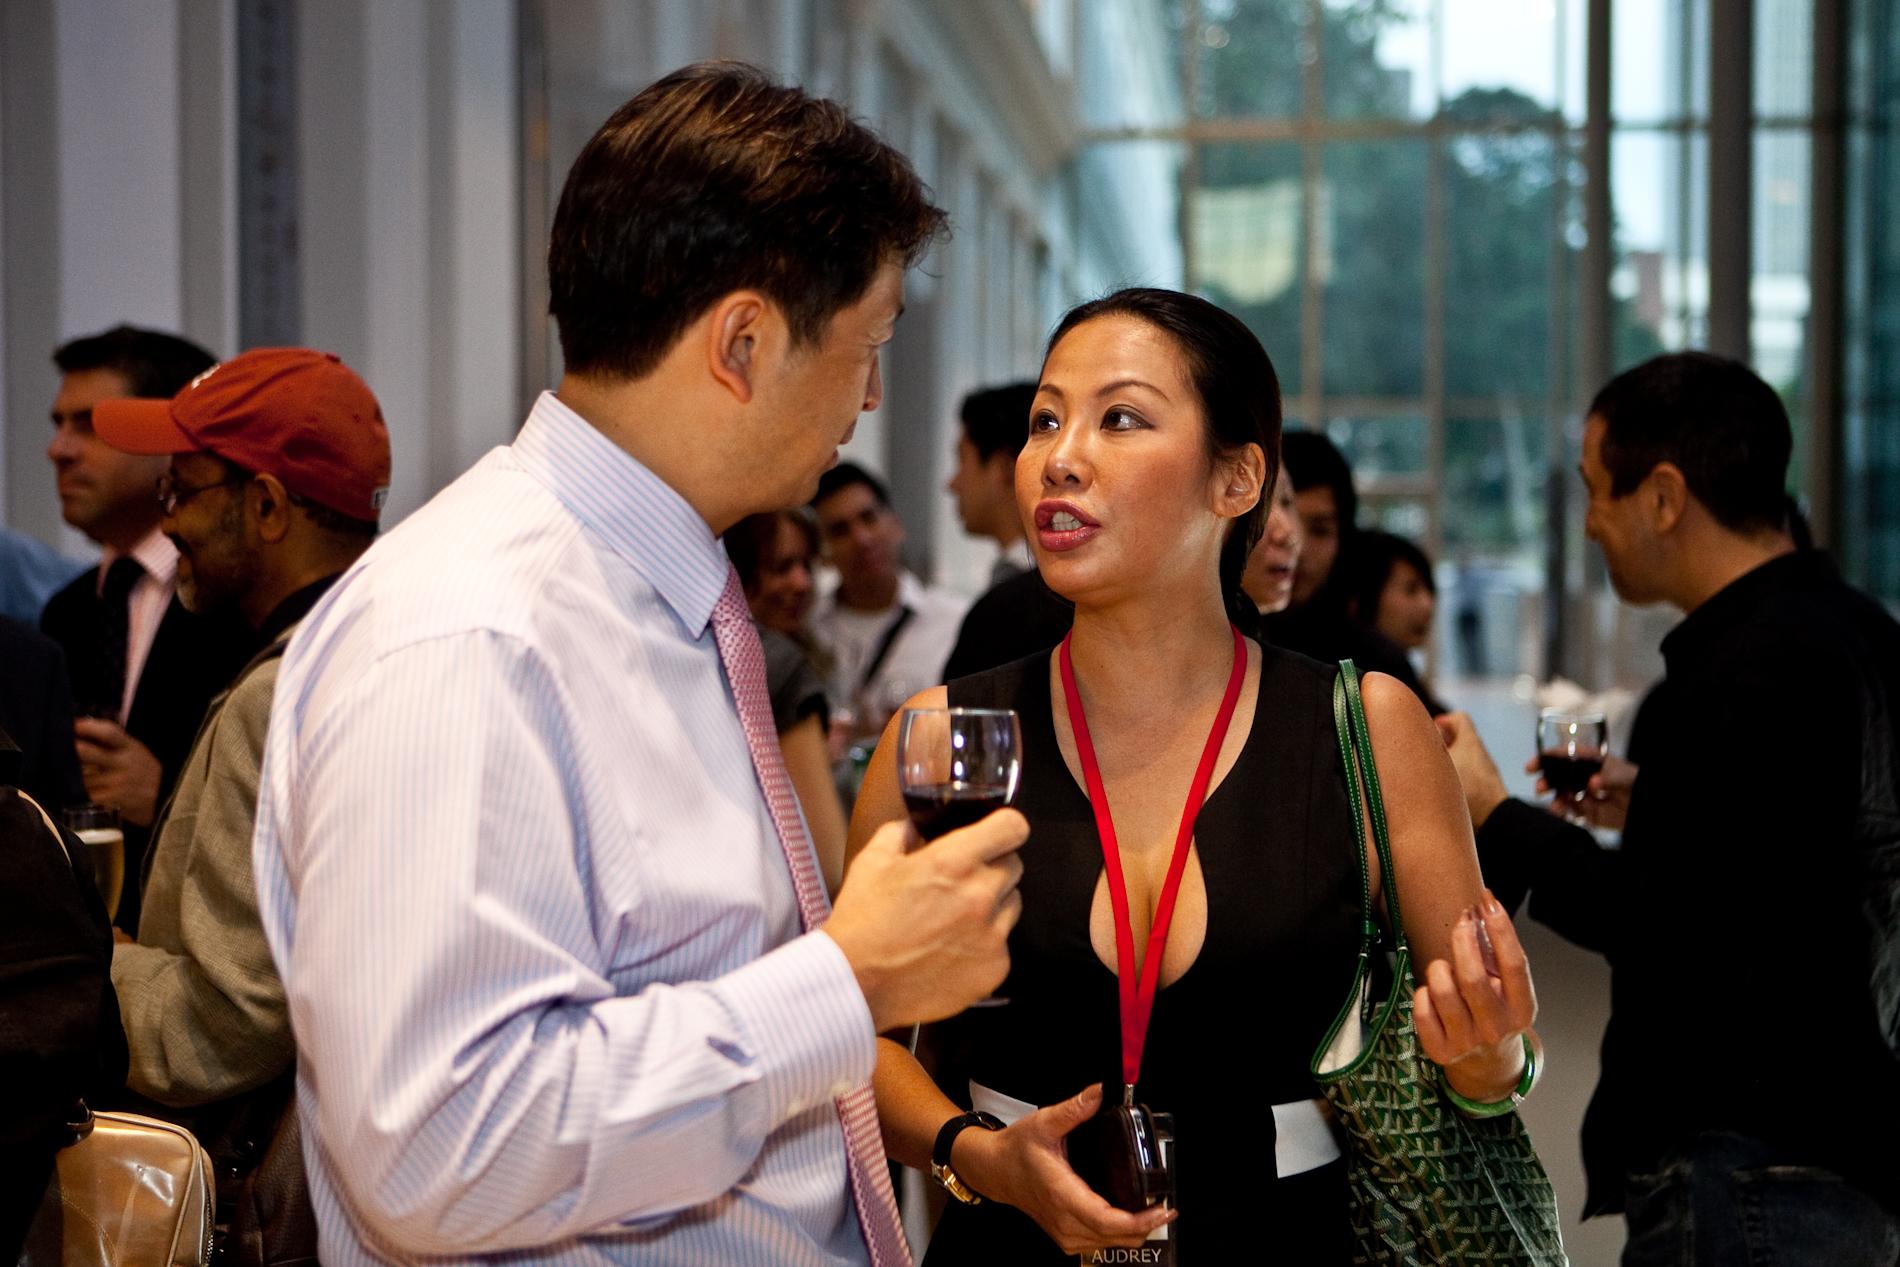 qi-global-2009-sustaible-design-singapore-082.jpg